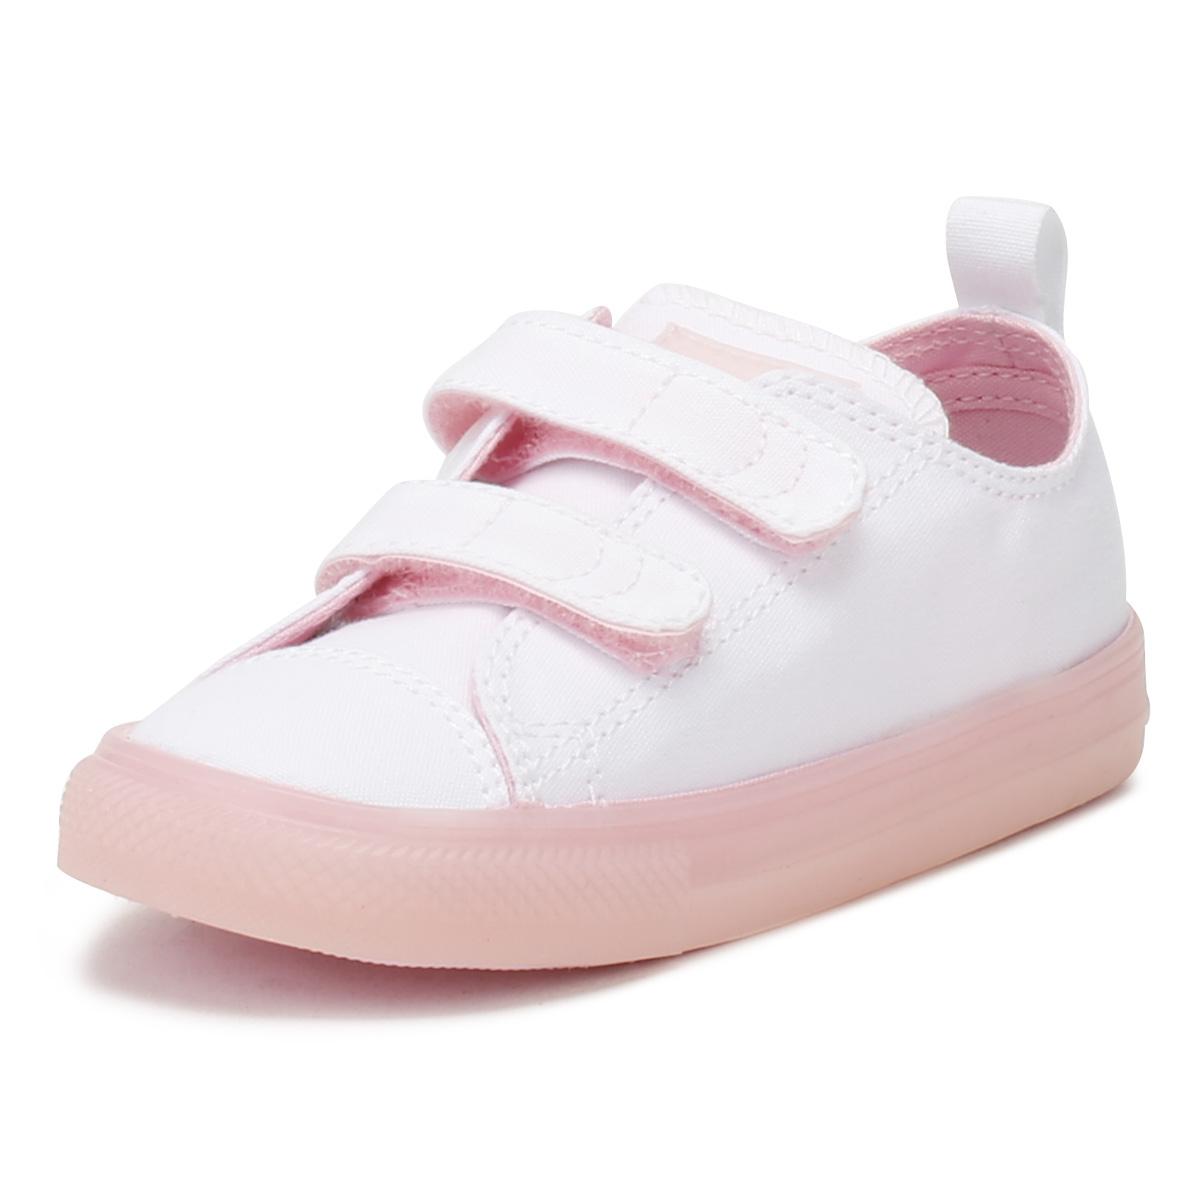 13908896234 Converse Chuck Taylor All Star II 2v White cherry Blossom Textile ...